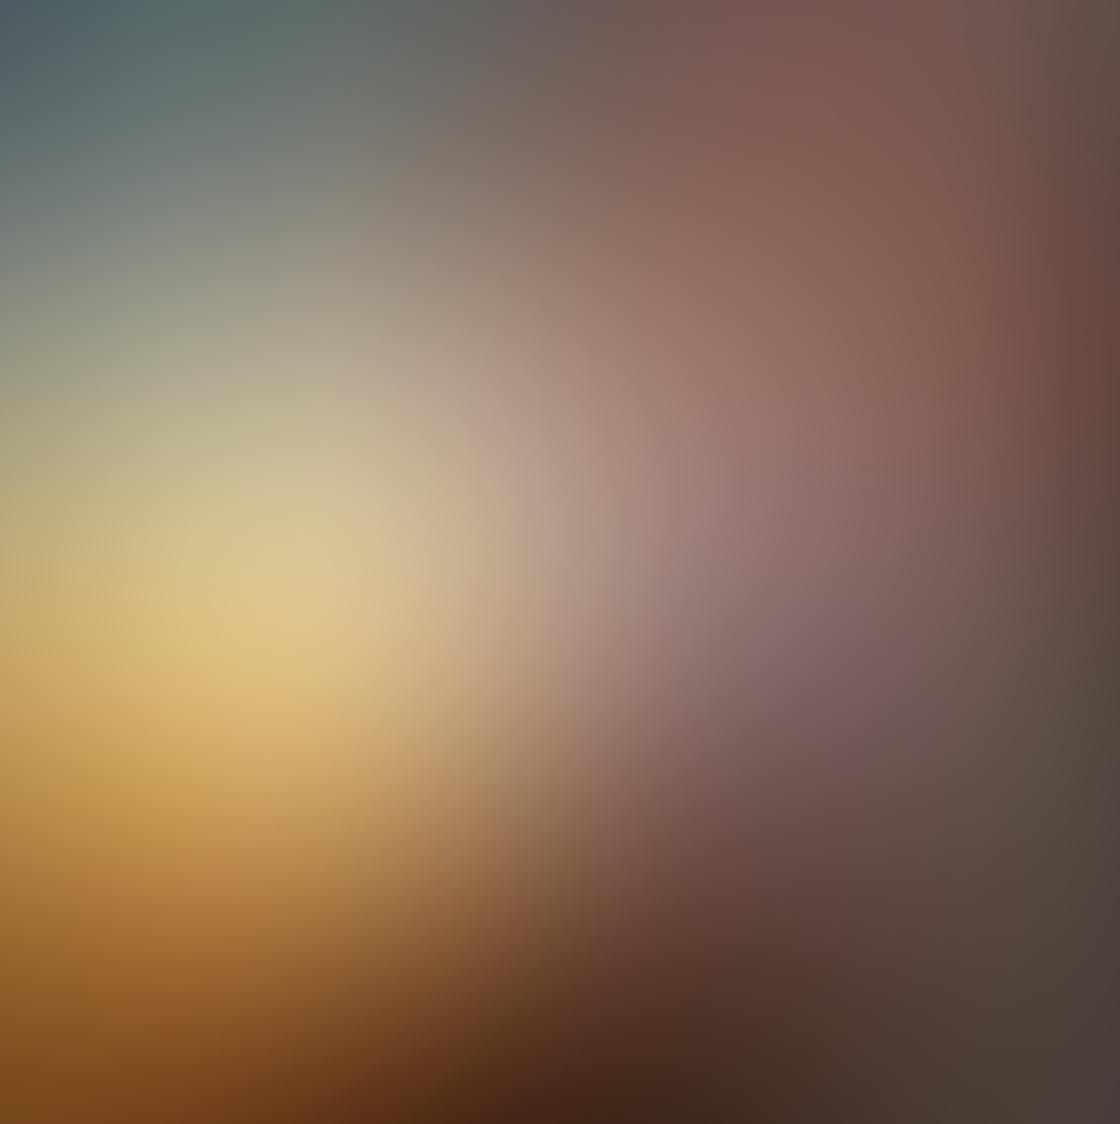 iPhone Photos Editing Styles 31